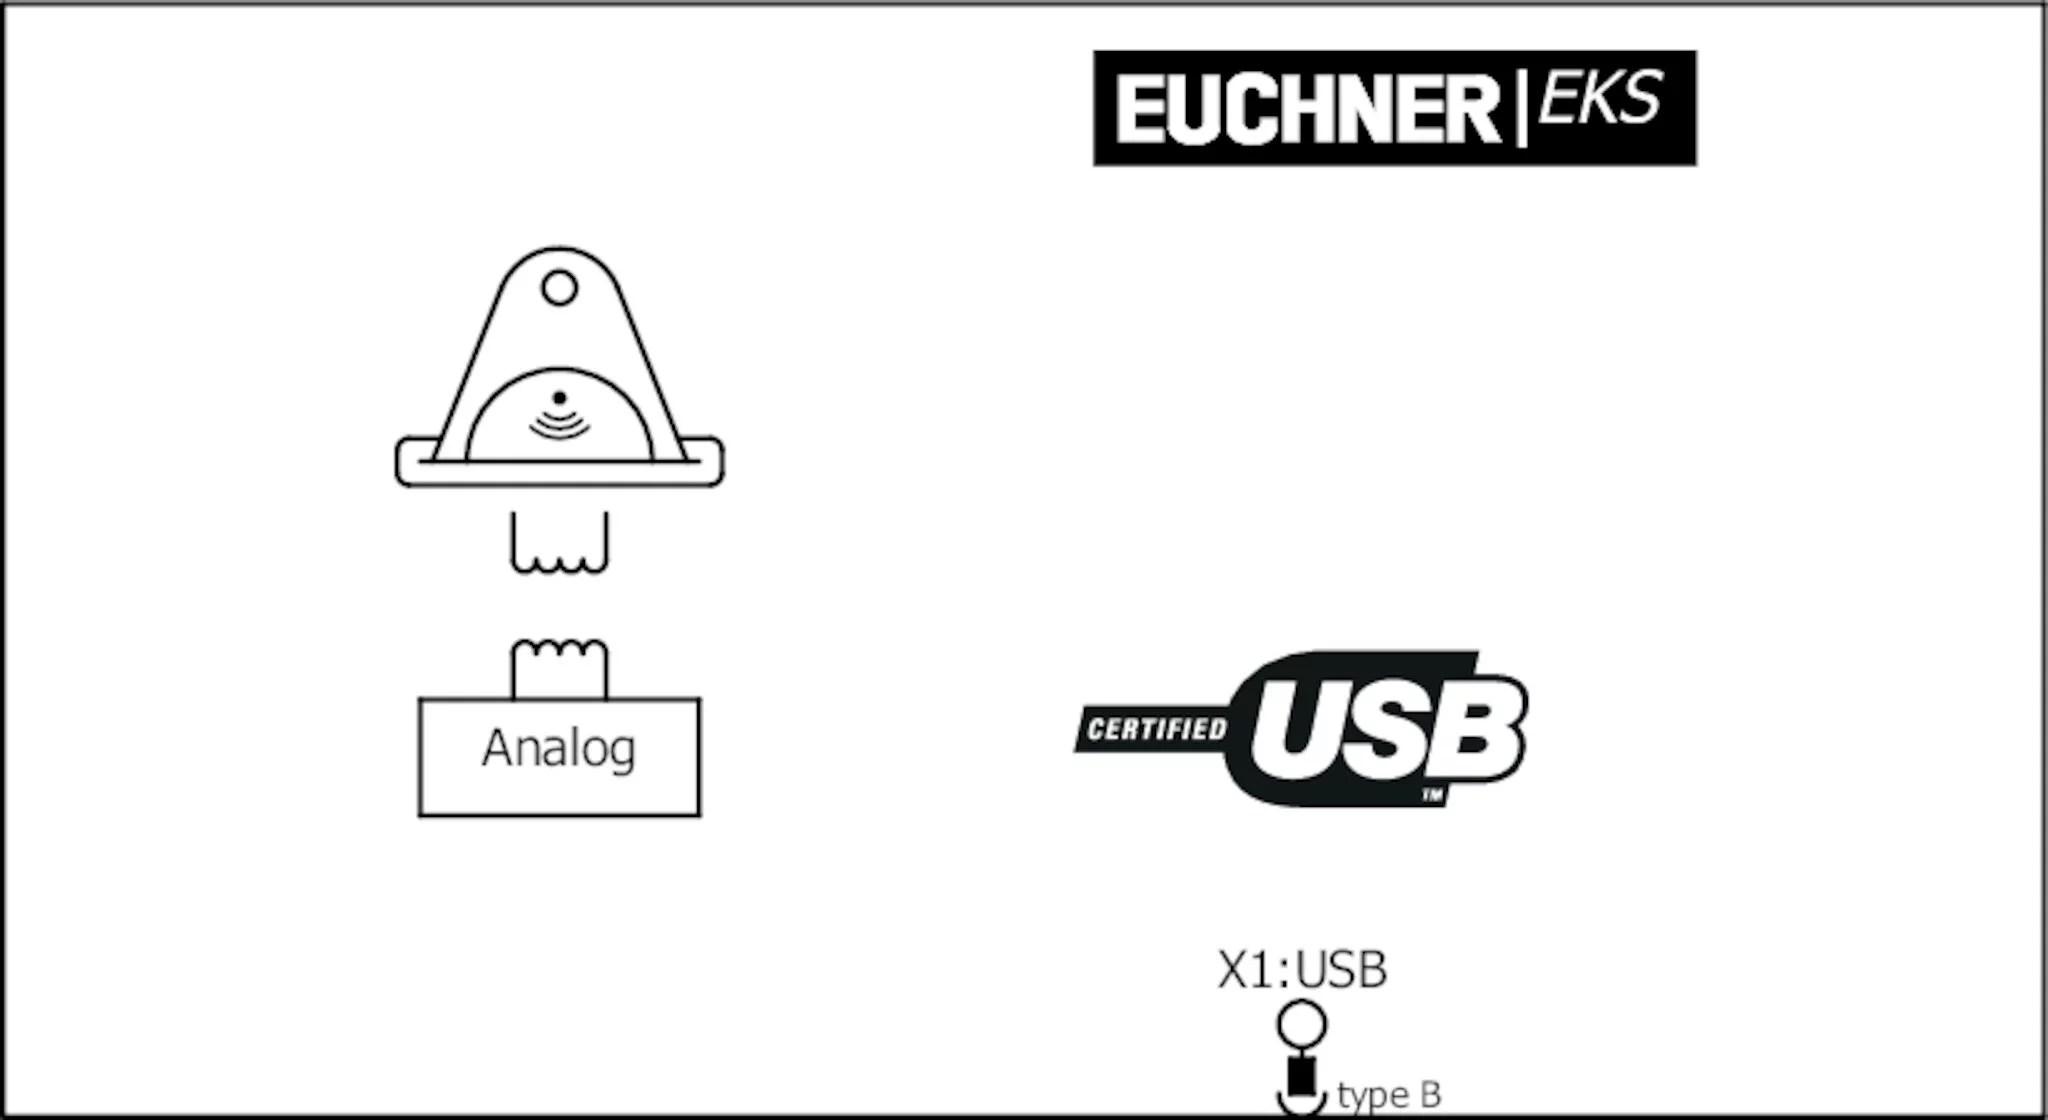 Eks A Iux G01 St01 Electronic Key Adapter With Usb